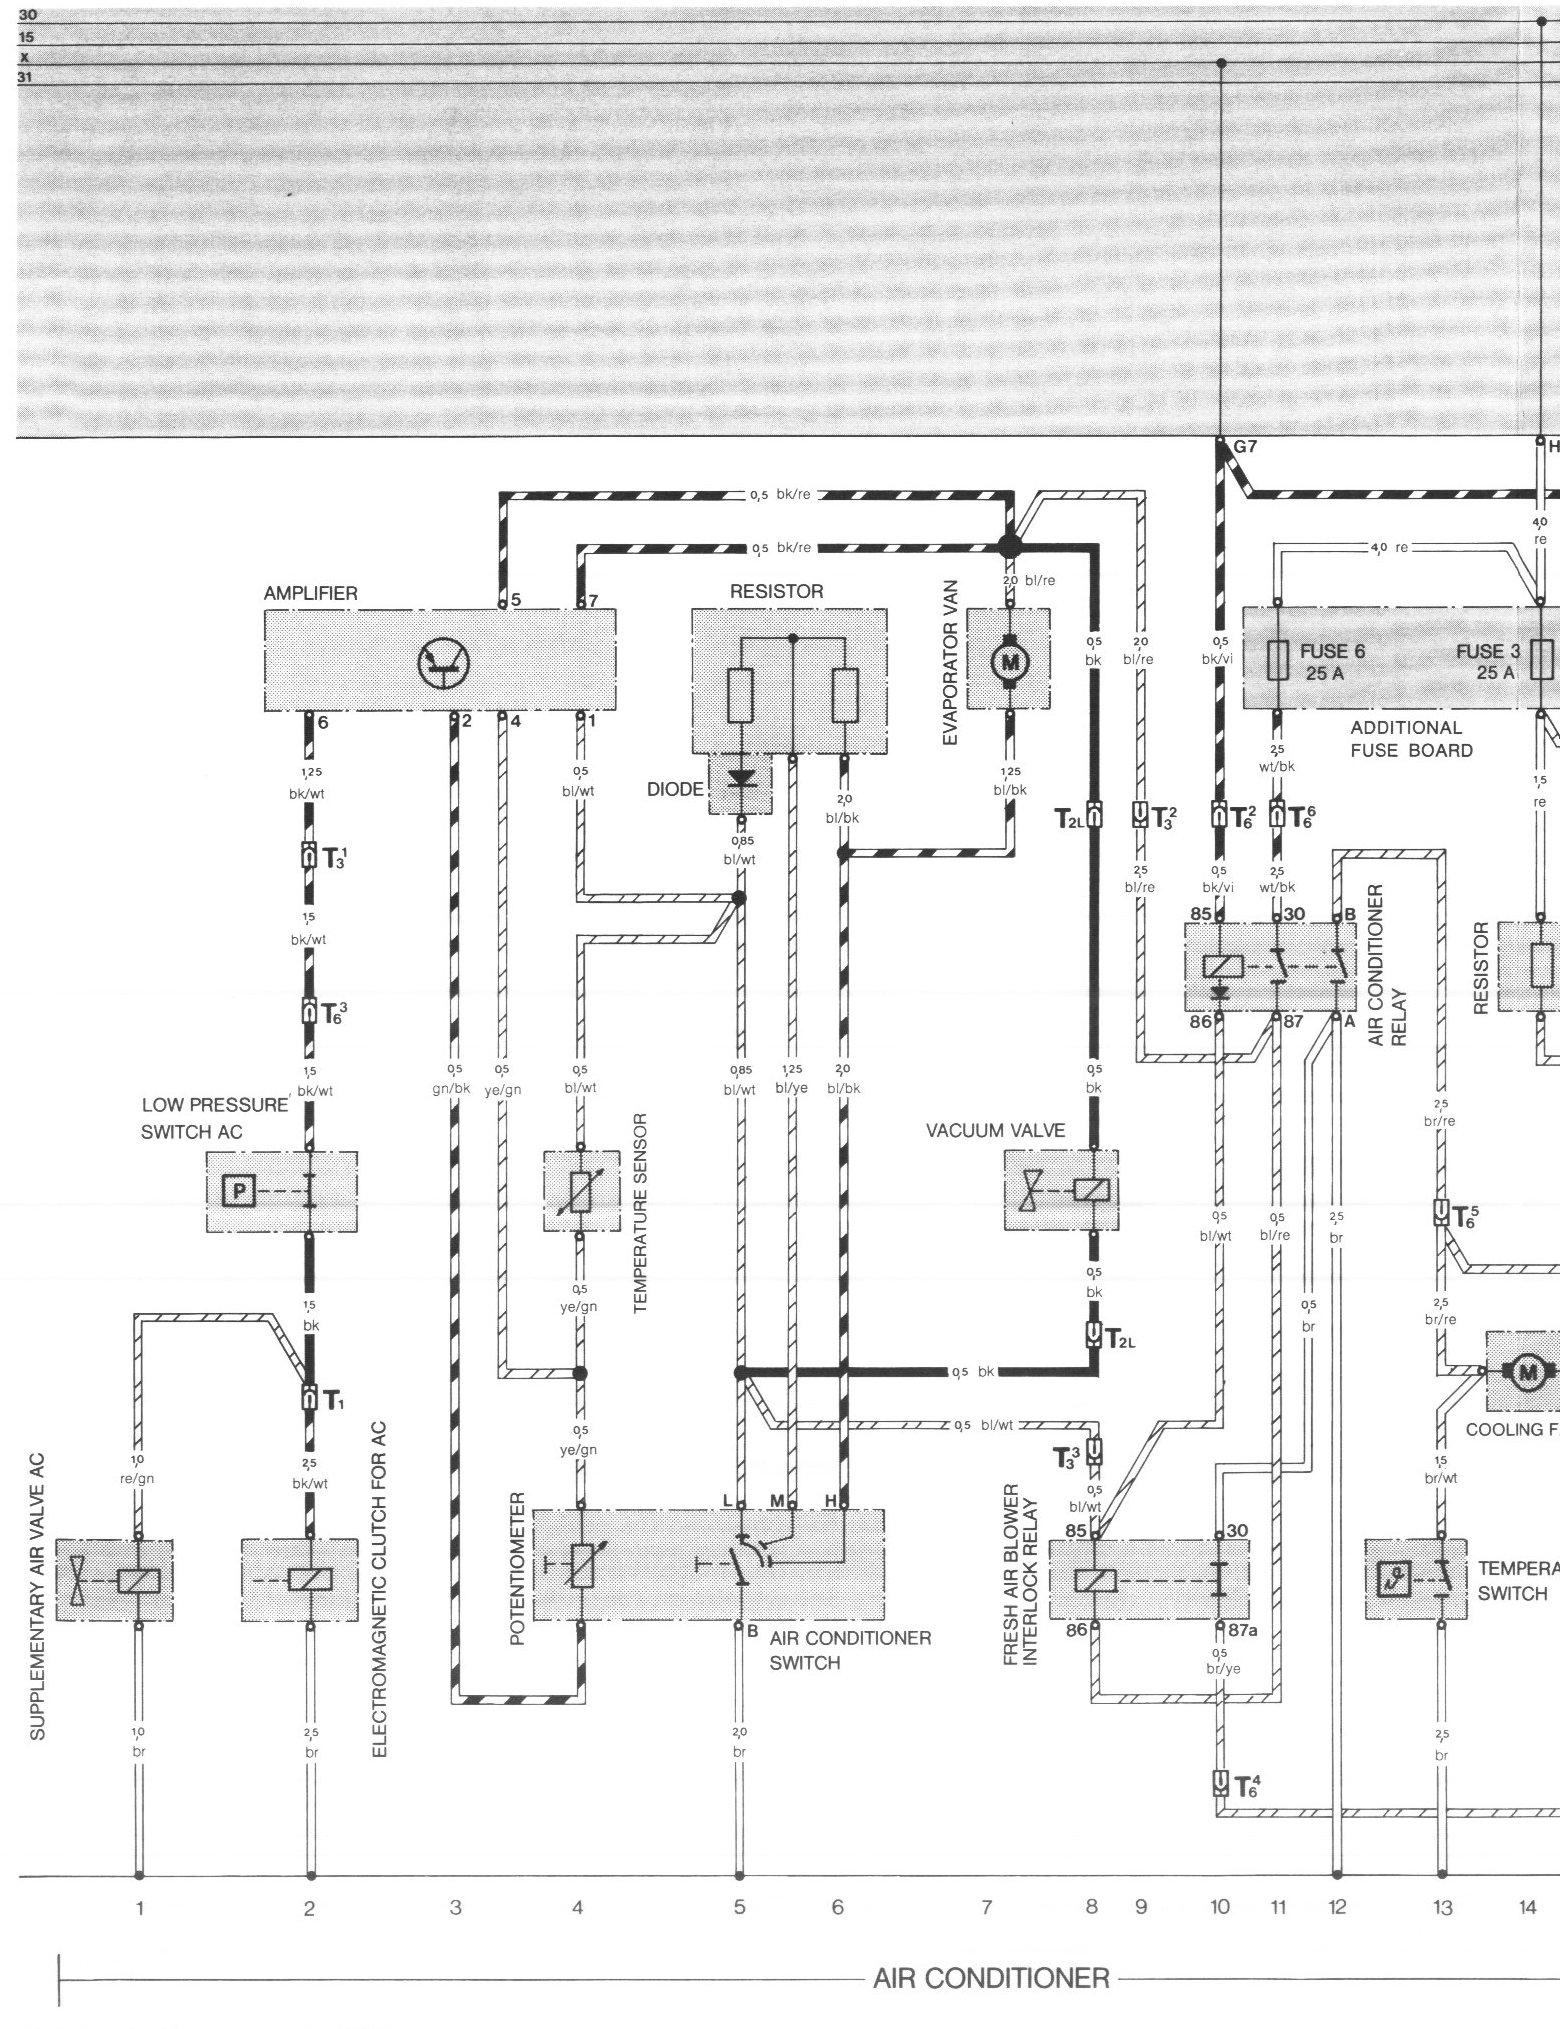 84 944 fuse box diagram wiring library 84 944 fuse box diagram